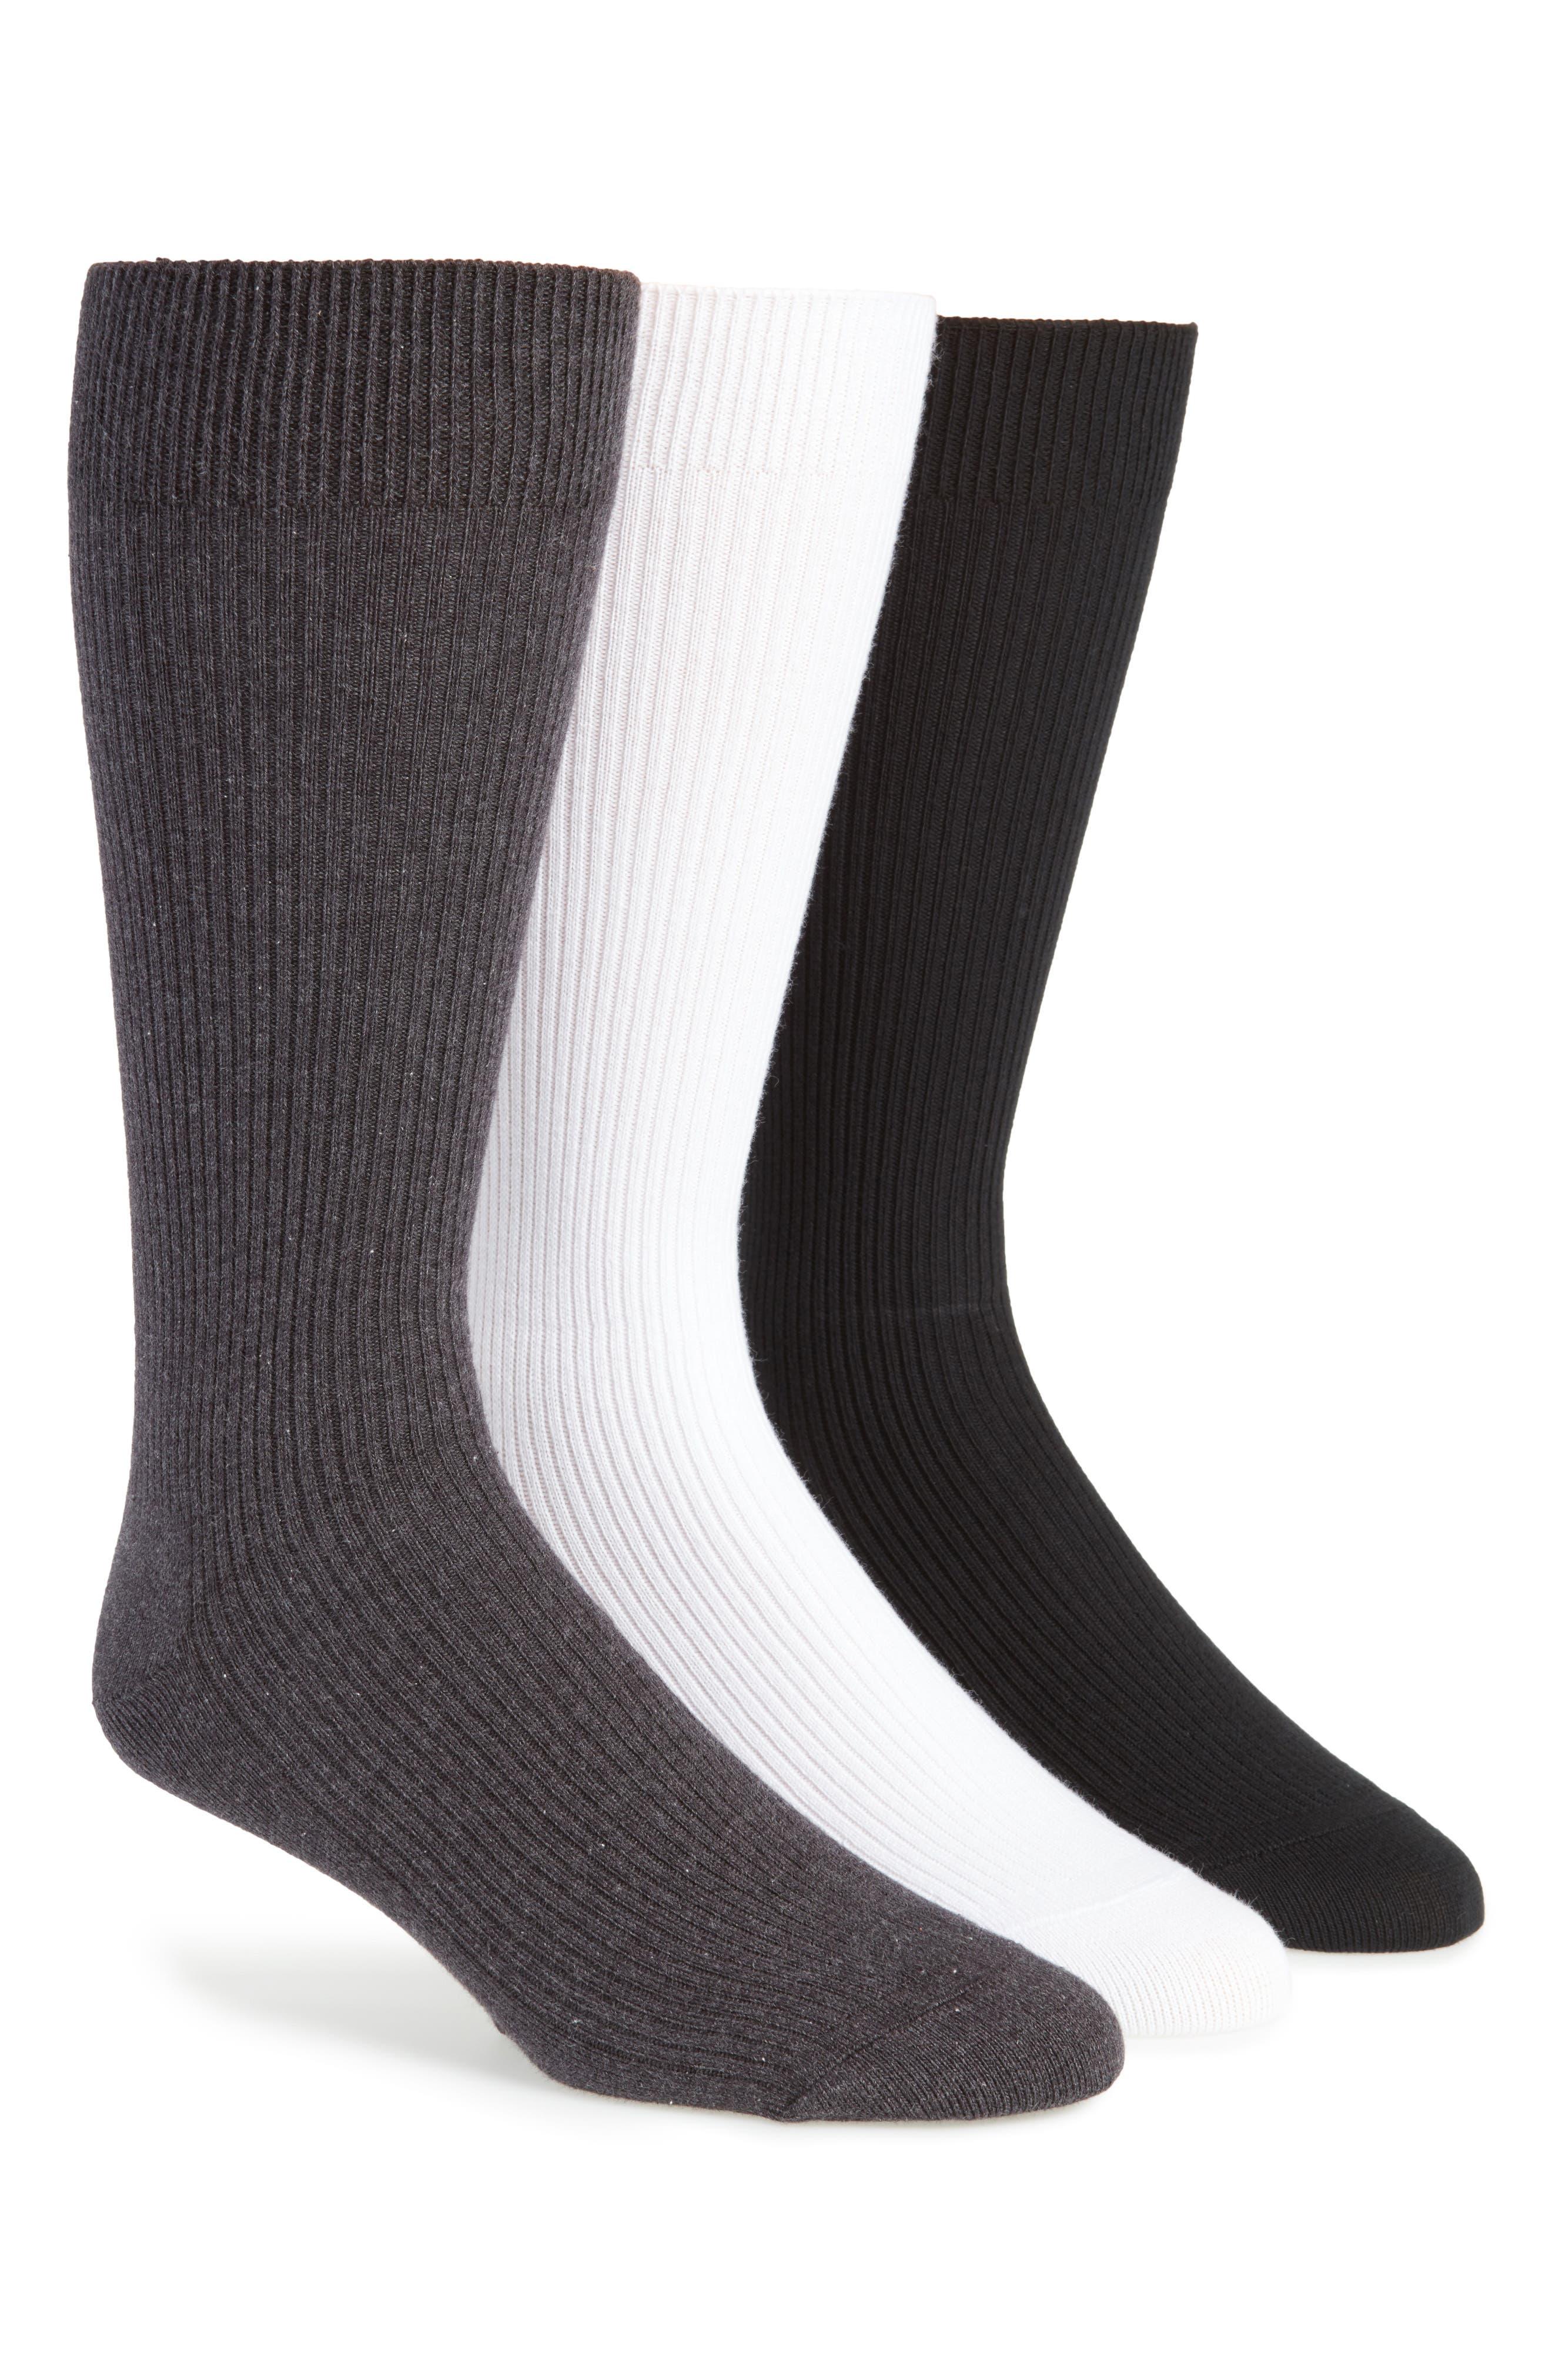 3-Pack Socks,                         Main,                         color, White/ Black/ Charcoal